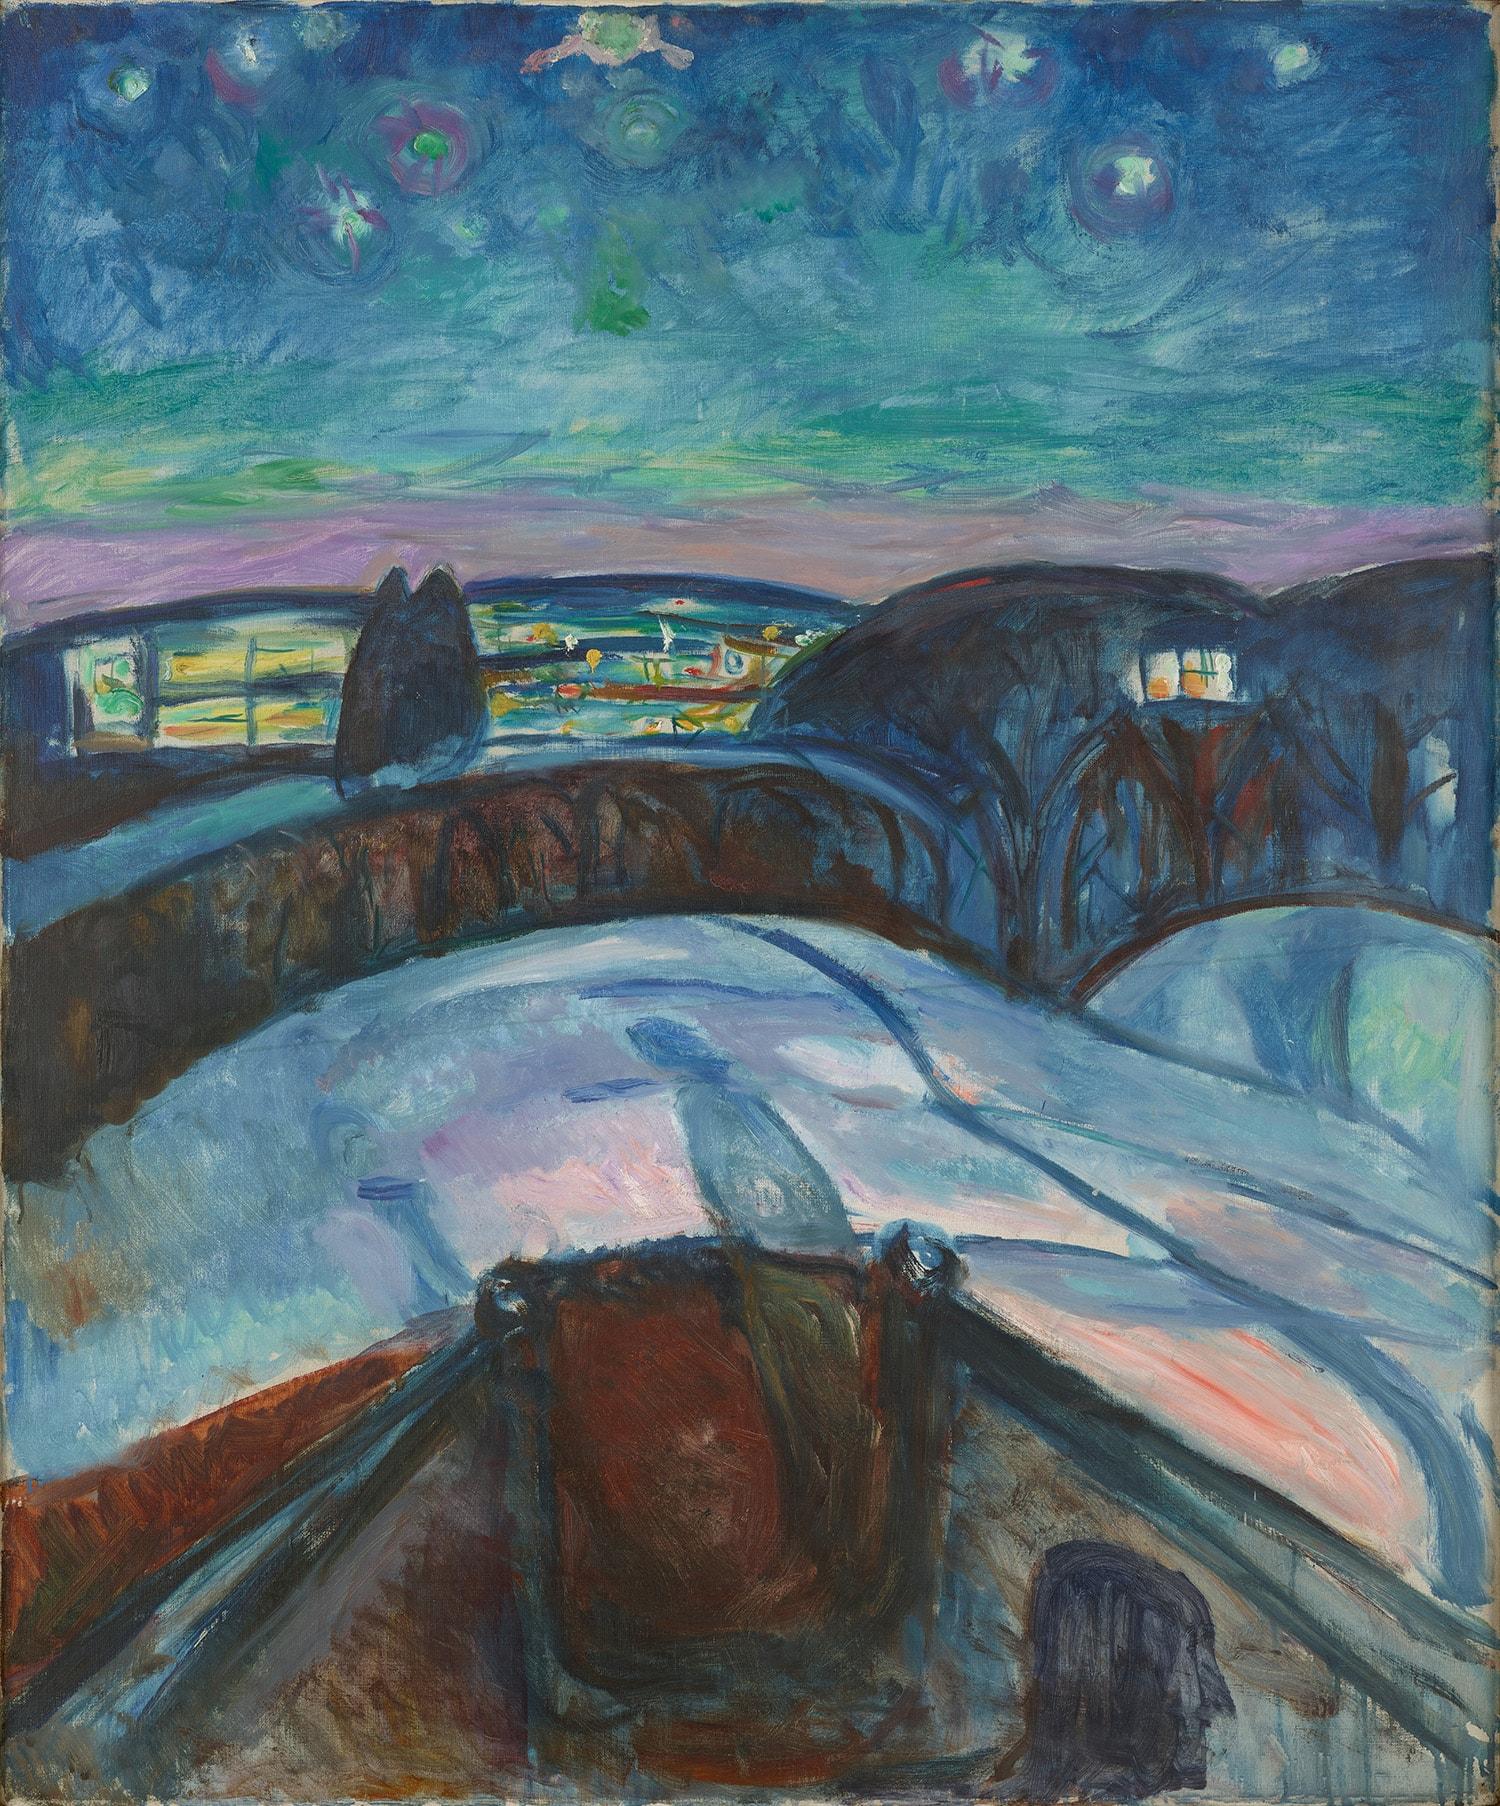 Edvard Munch's 'Starry Night', 1922–1924 | © 2017 Artists Rights Society (ARS), New York / Munch Museum